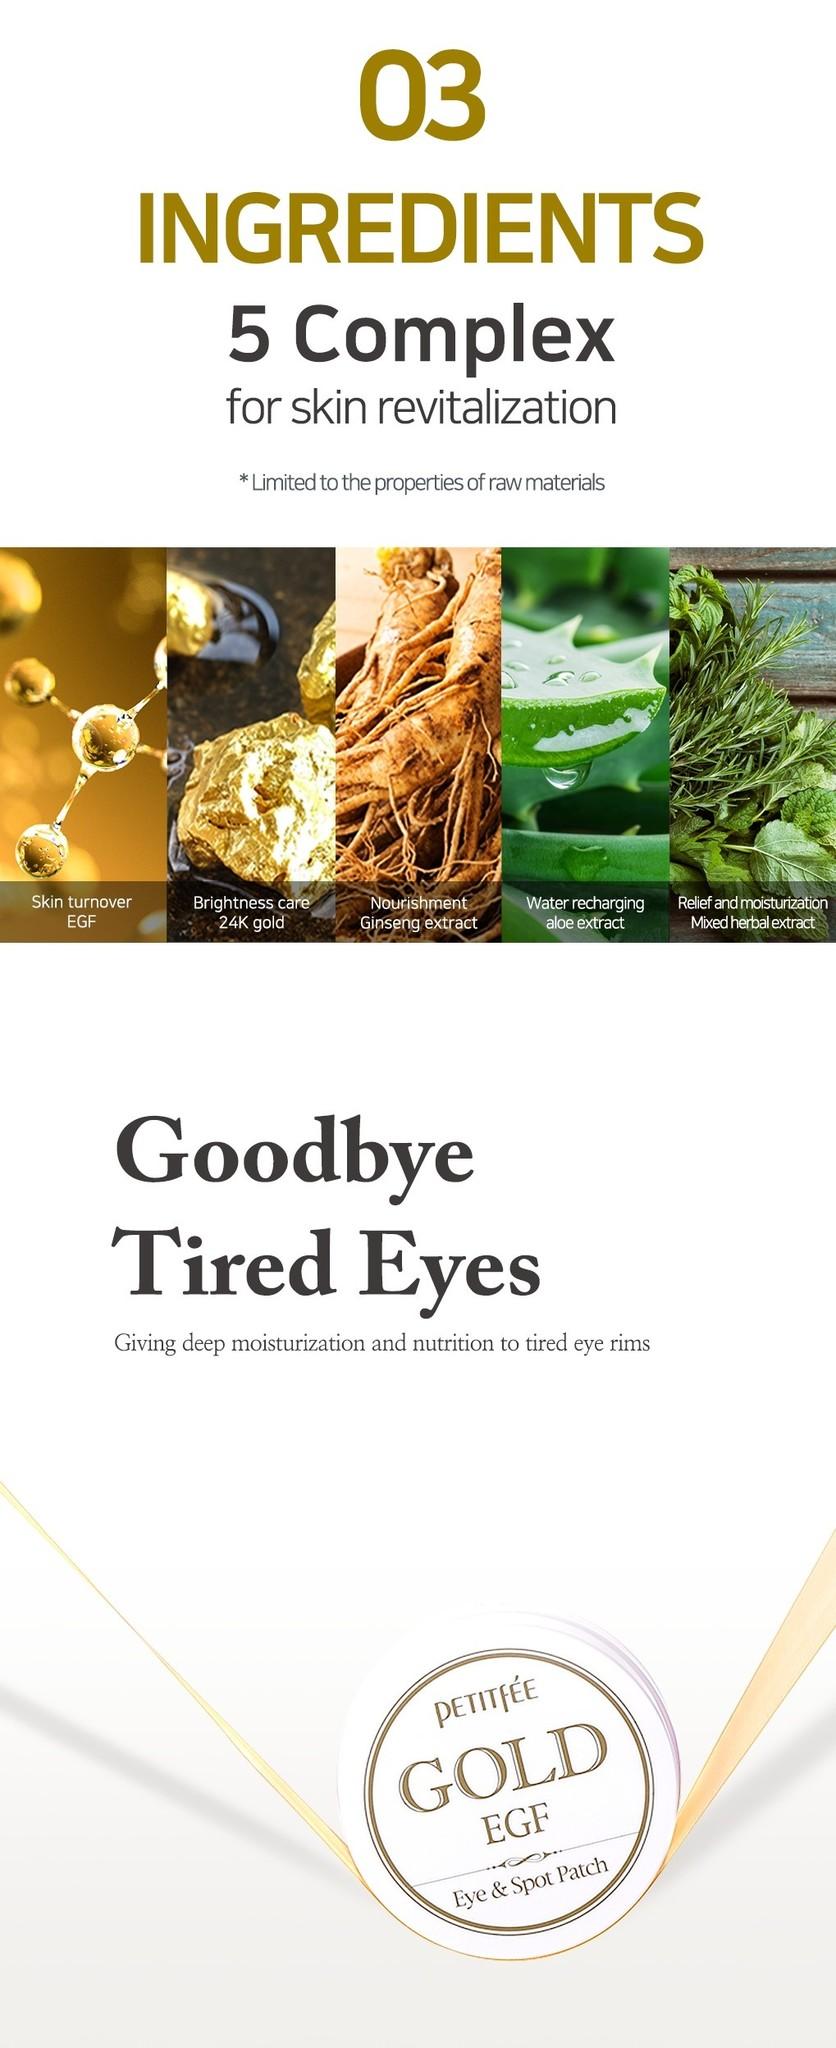 Gold & EGF Eye & Spot Patch-6